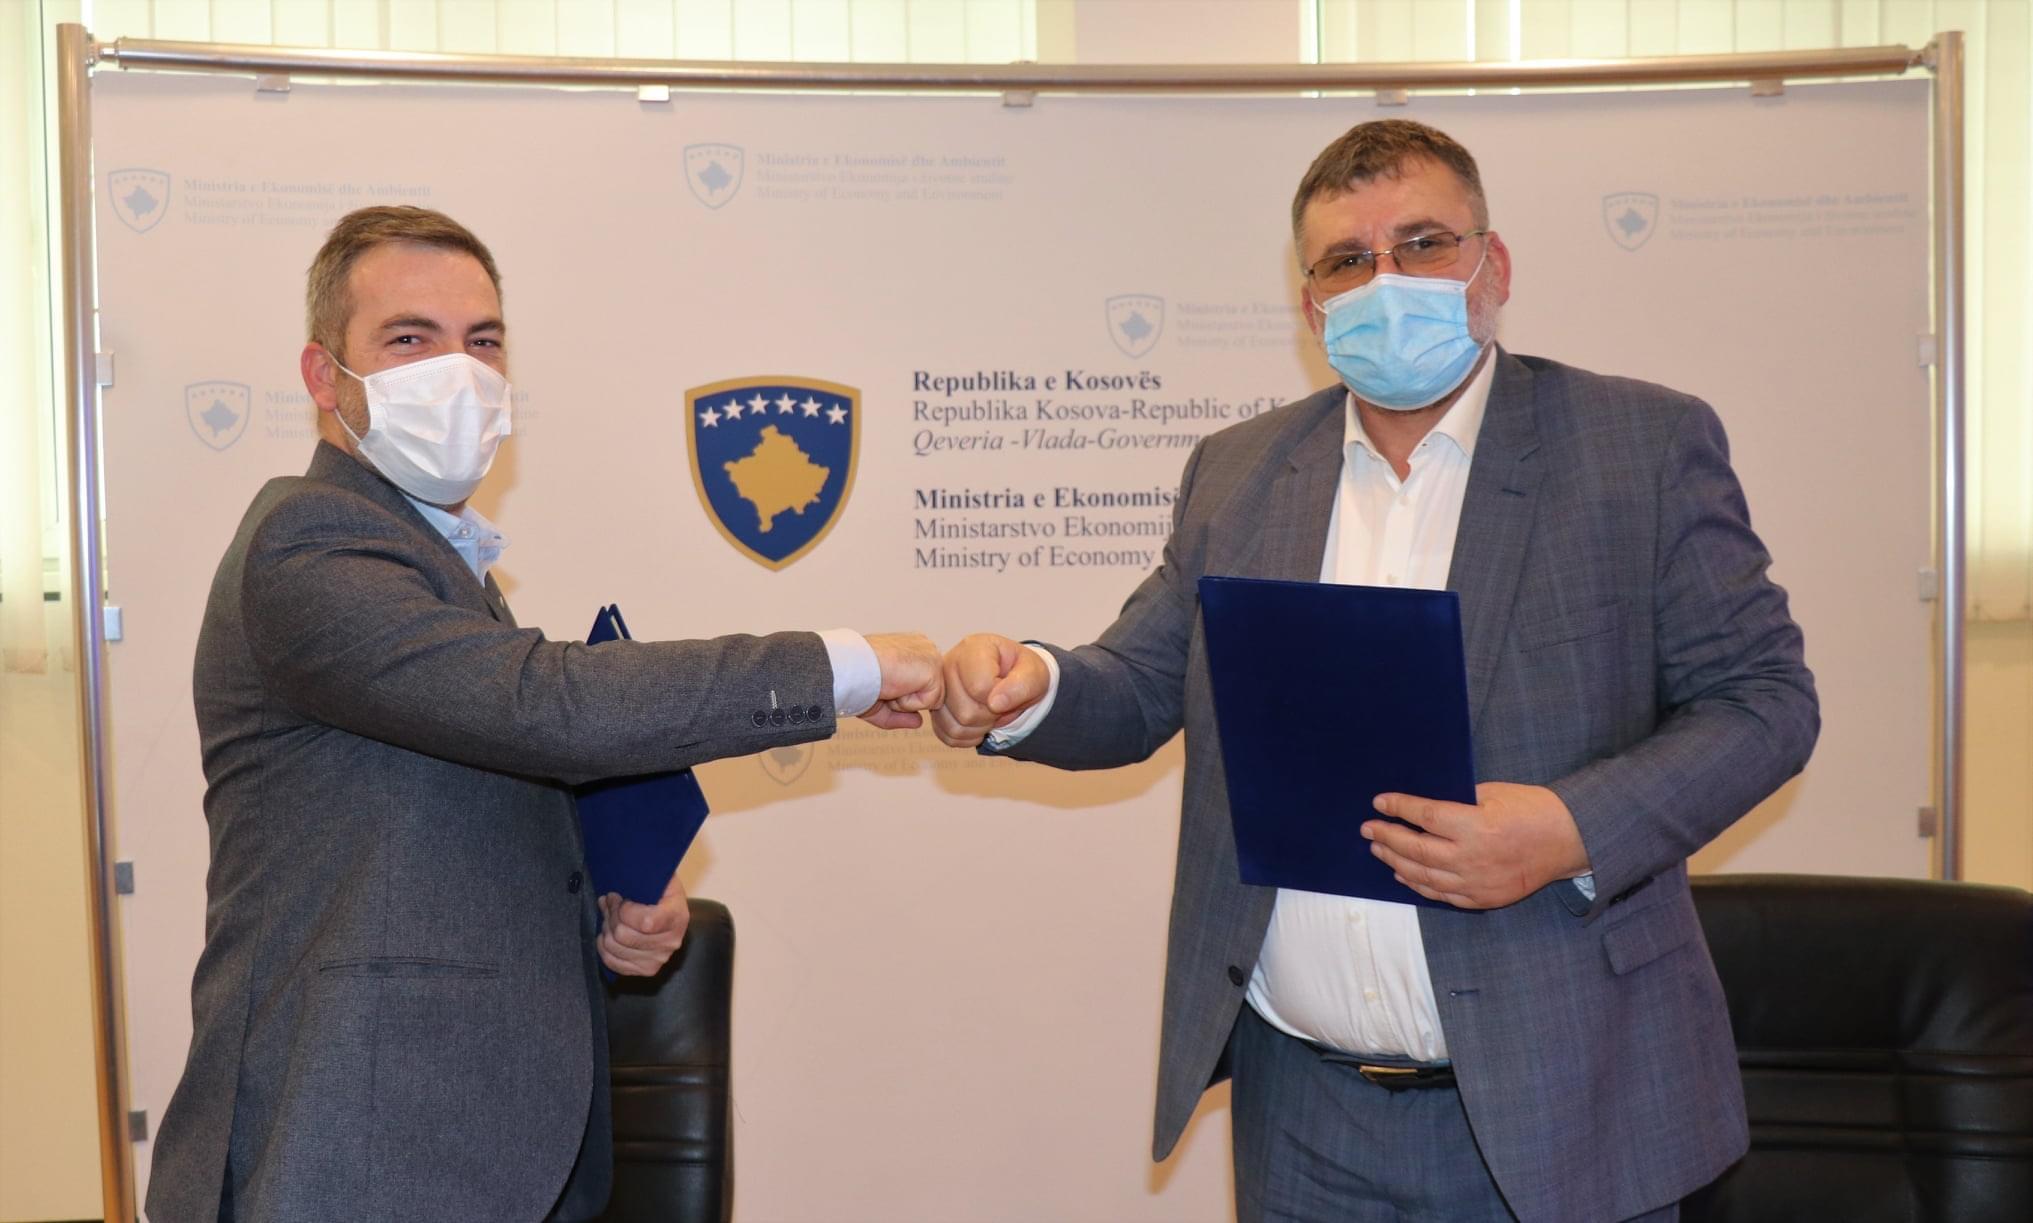 Ministri Kuçi subvencionon Parkun e Inovacionit me 2 milion Euro